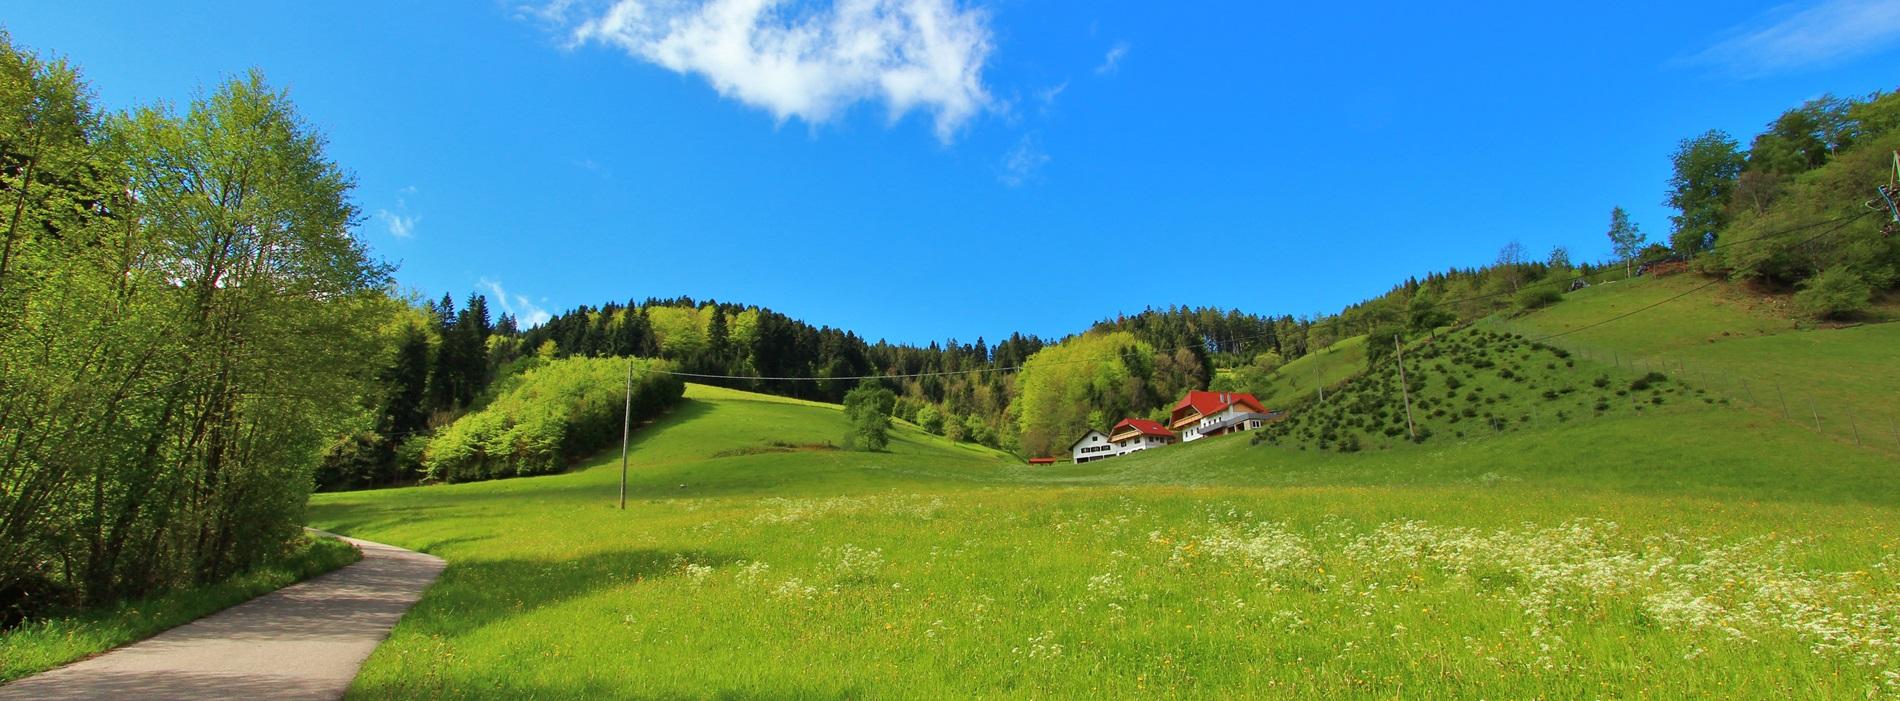 Anfahrt Stinneshof Zuwald Oberharmersbach